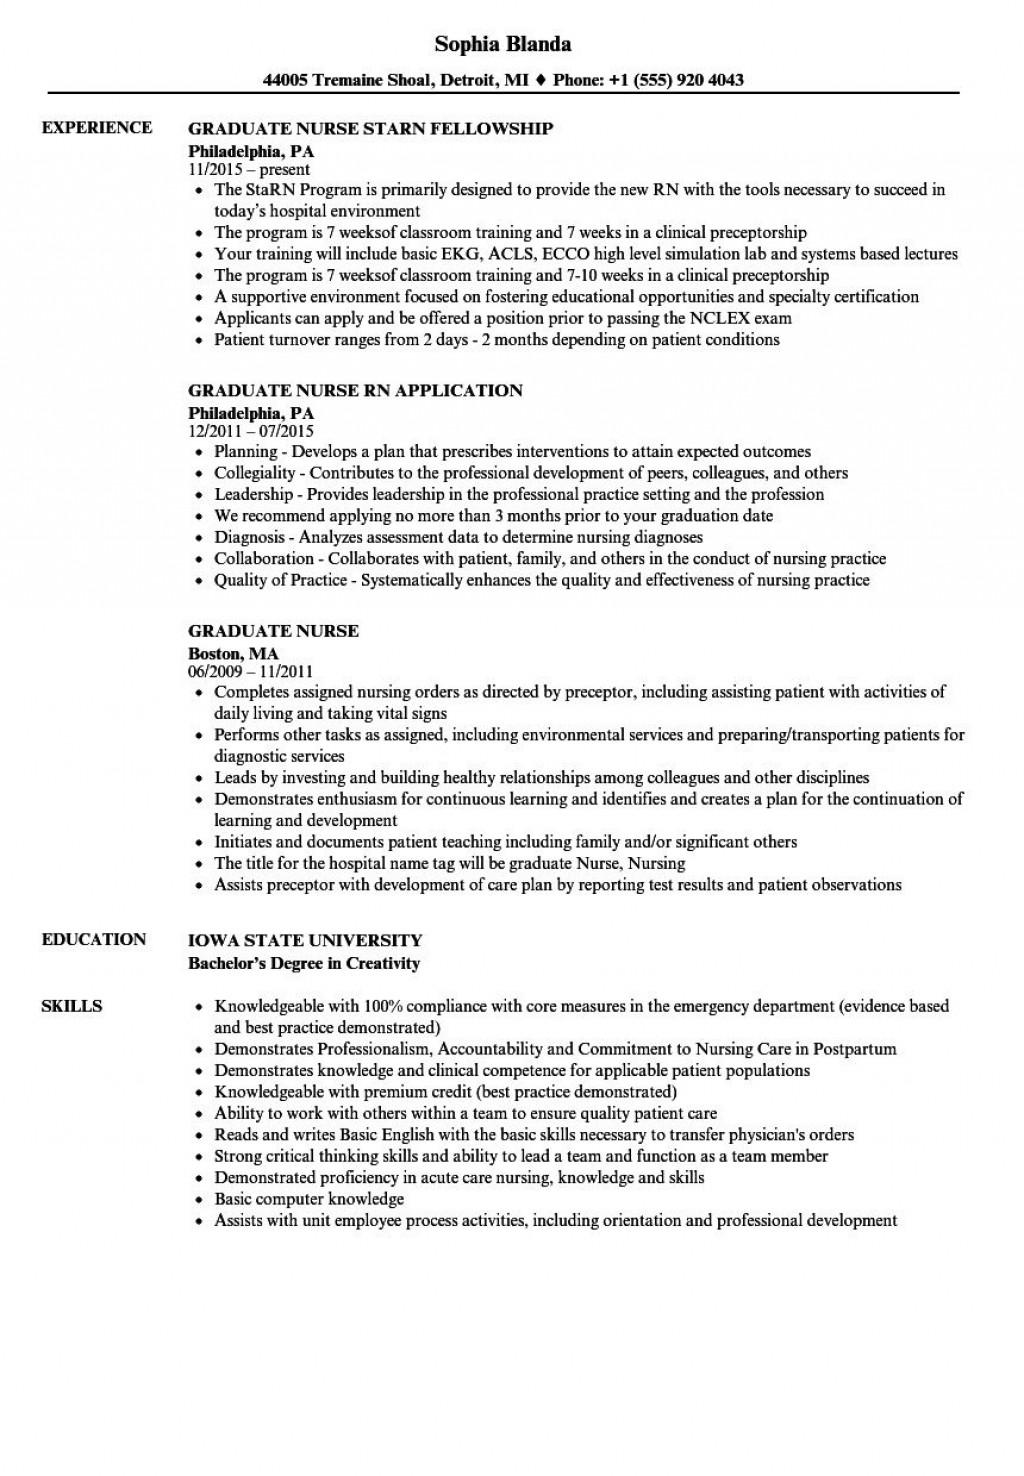 004 Breathtaking Graduate Nurse Resume Template Picture  Student Free New Practitioner GradLarge